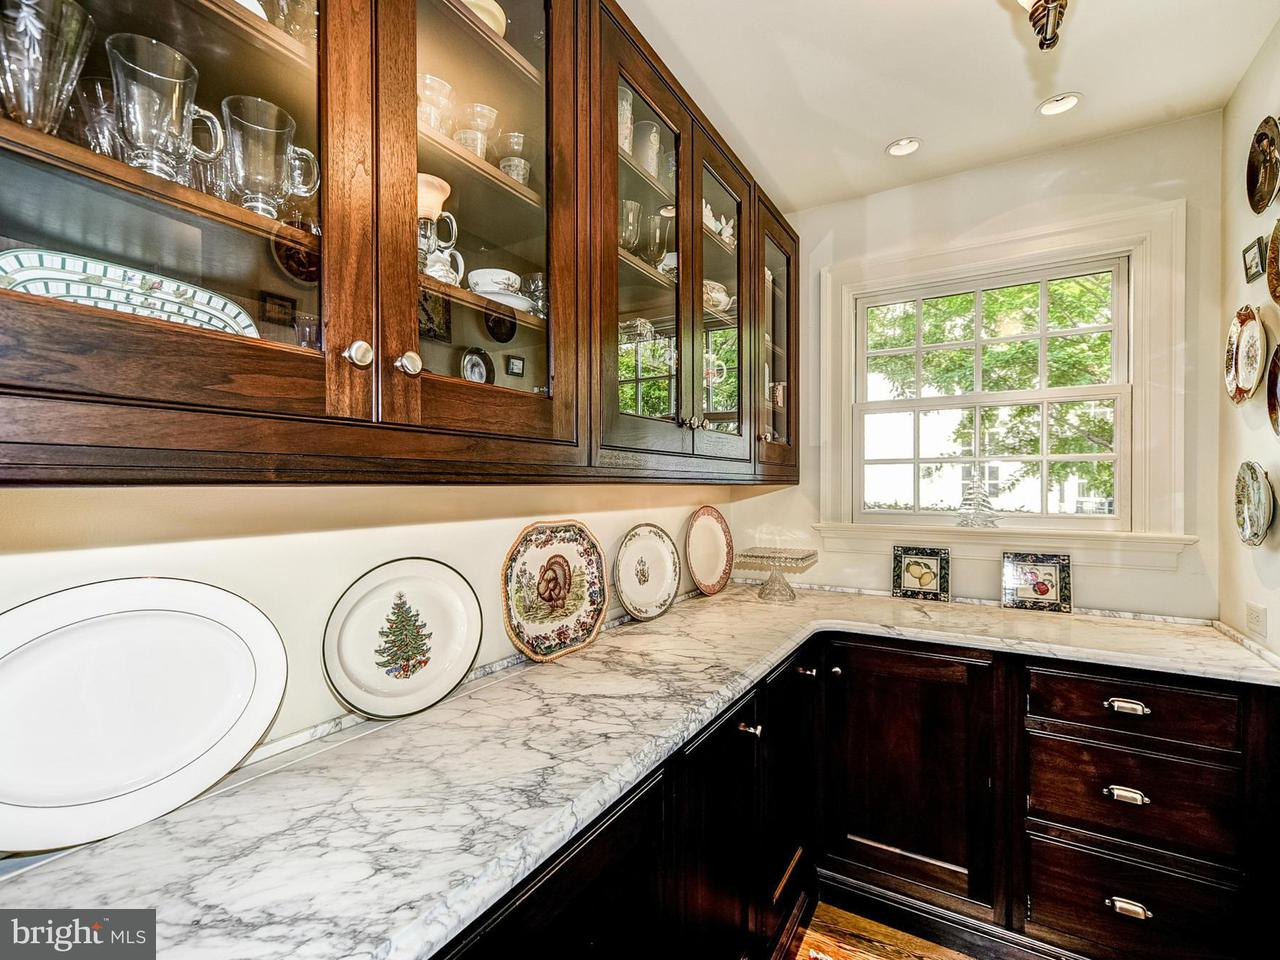 Additional photo for property listing at 2013 HOMEWOOD Road 2013 HOMEWOOD Road Annapolis, Maryland 21409 Estados Unidos